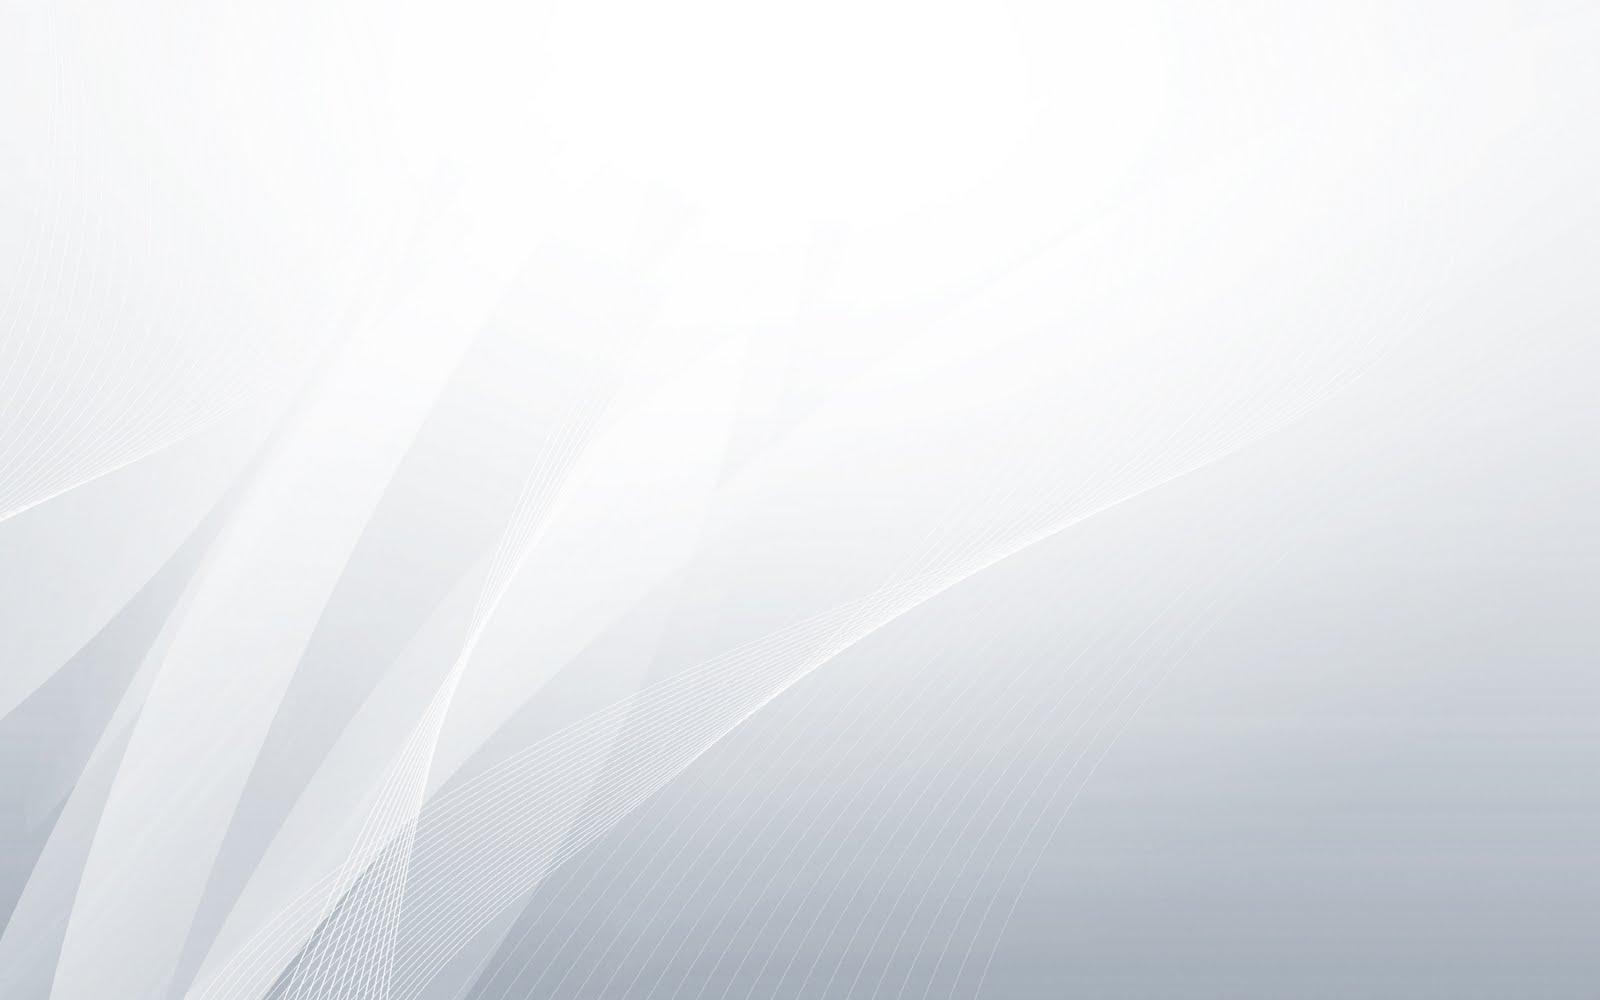 White_Background_Hd_04